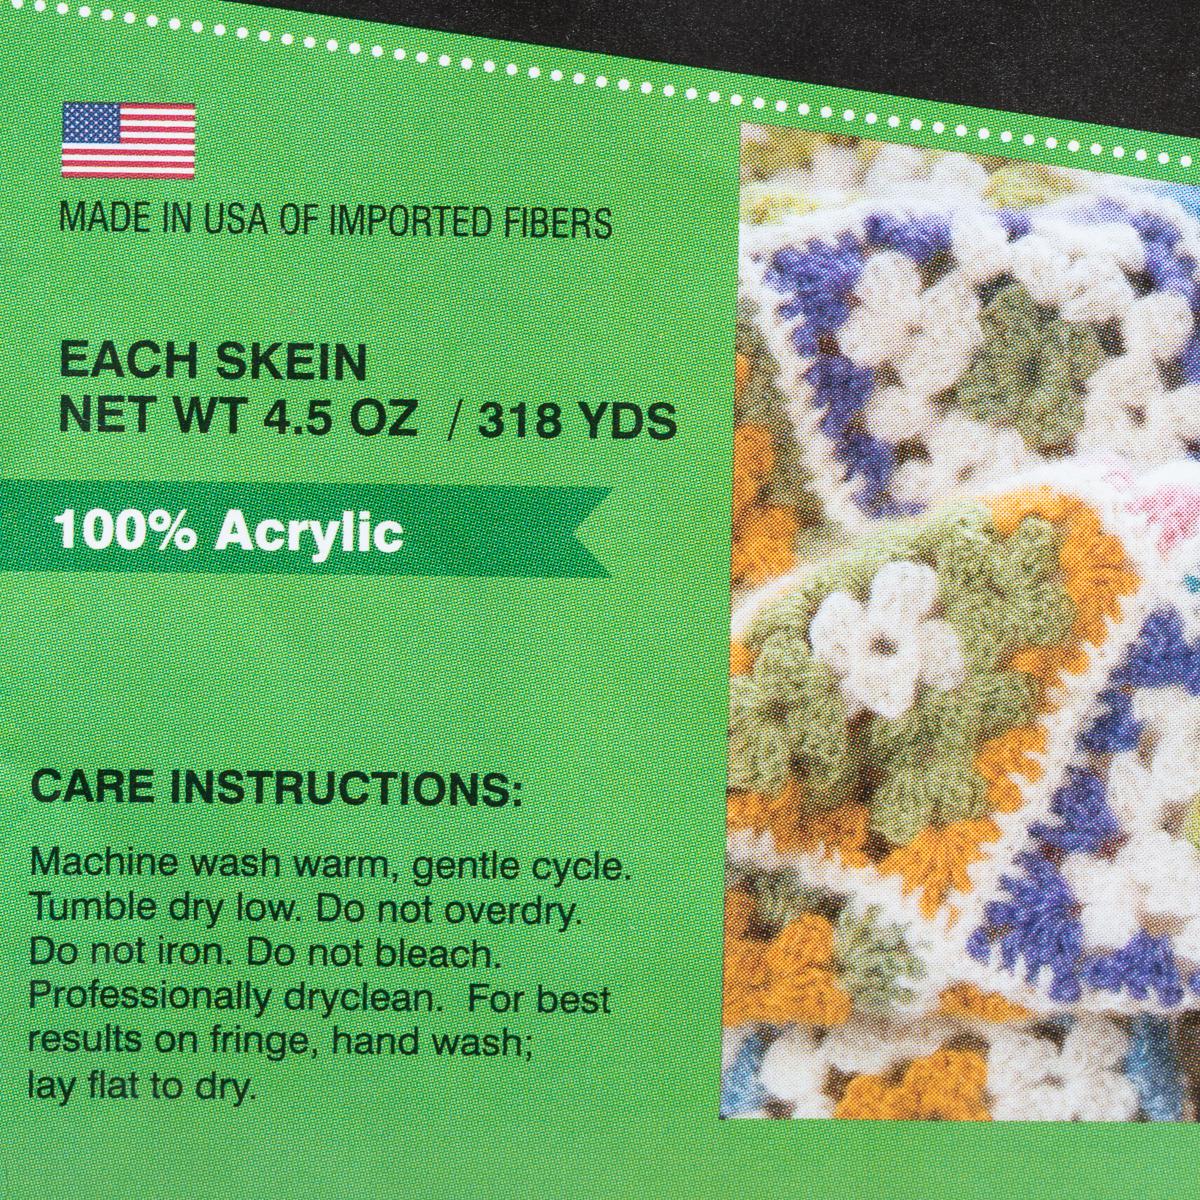 4-Dream-Weaver-Solid-S-Twist-100-Acrylic-Yarn-Skeins-Light-3-Knit-Crochet-Soft thumbnail 15